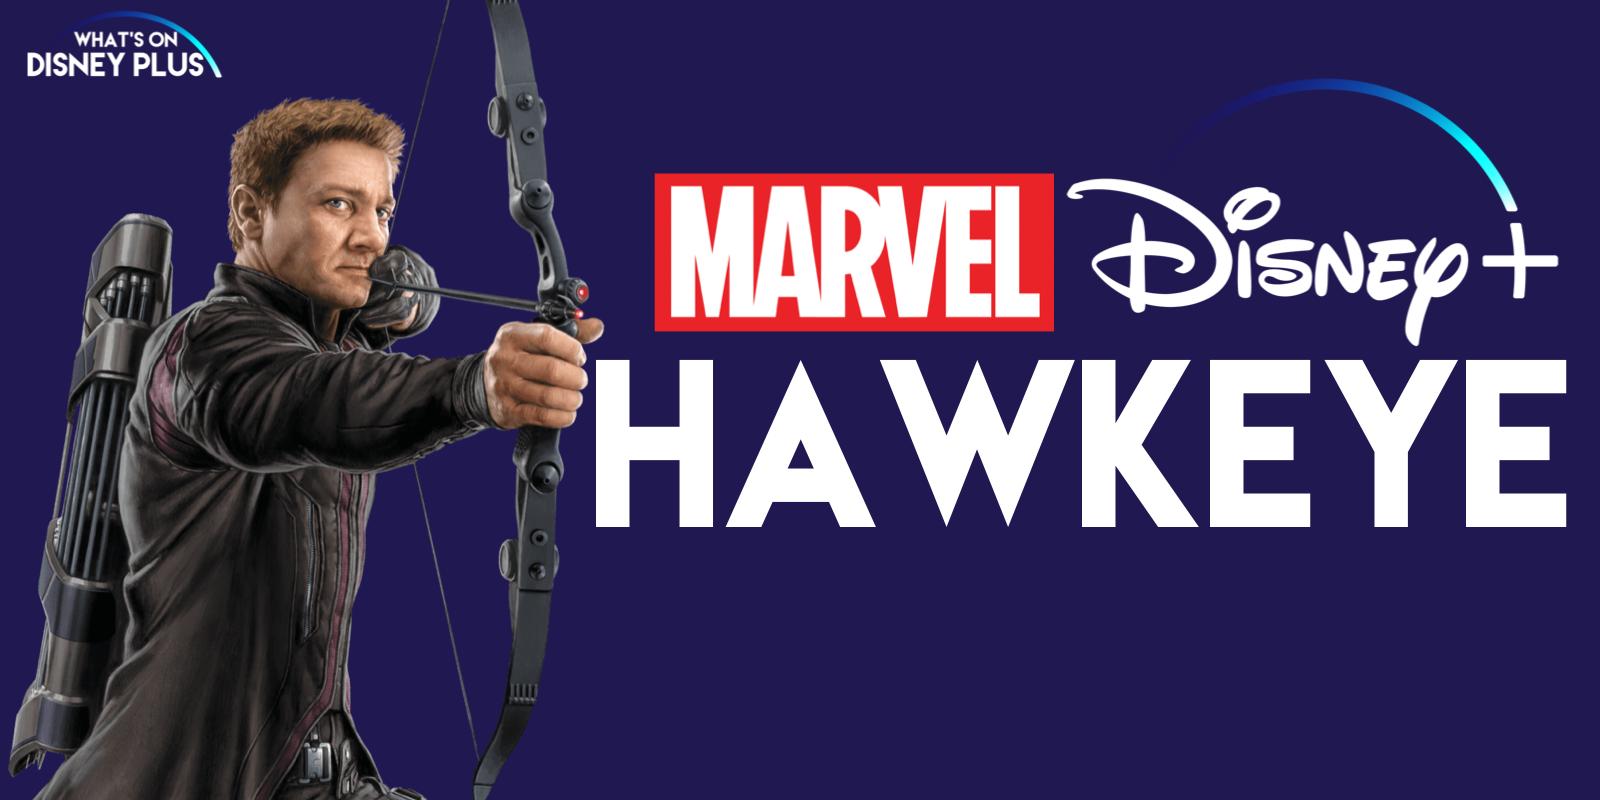 Disney+ Hawkeye Series Rumored To Be Delayed | What's On Disney Plus